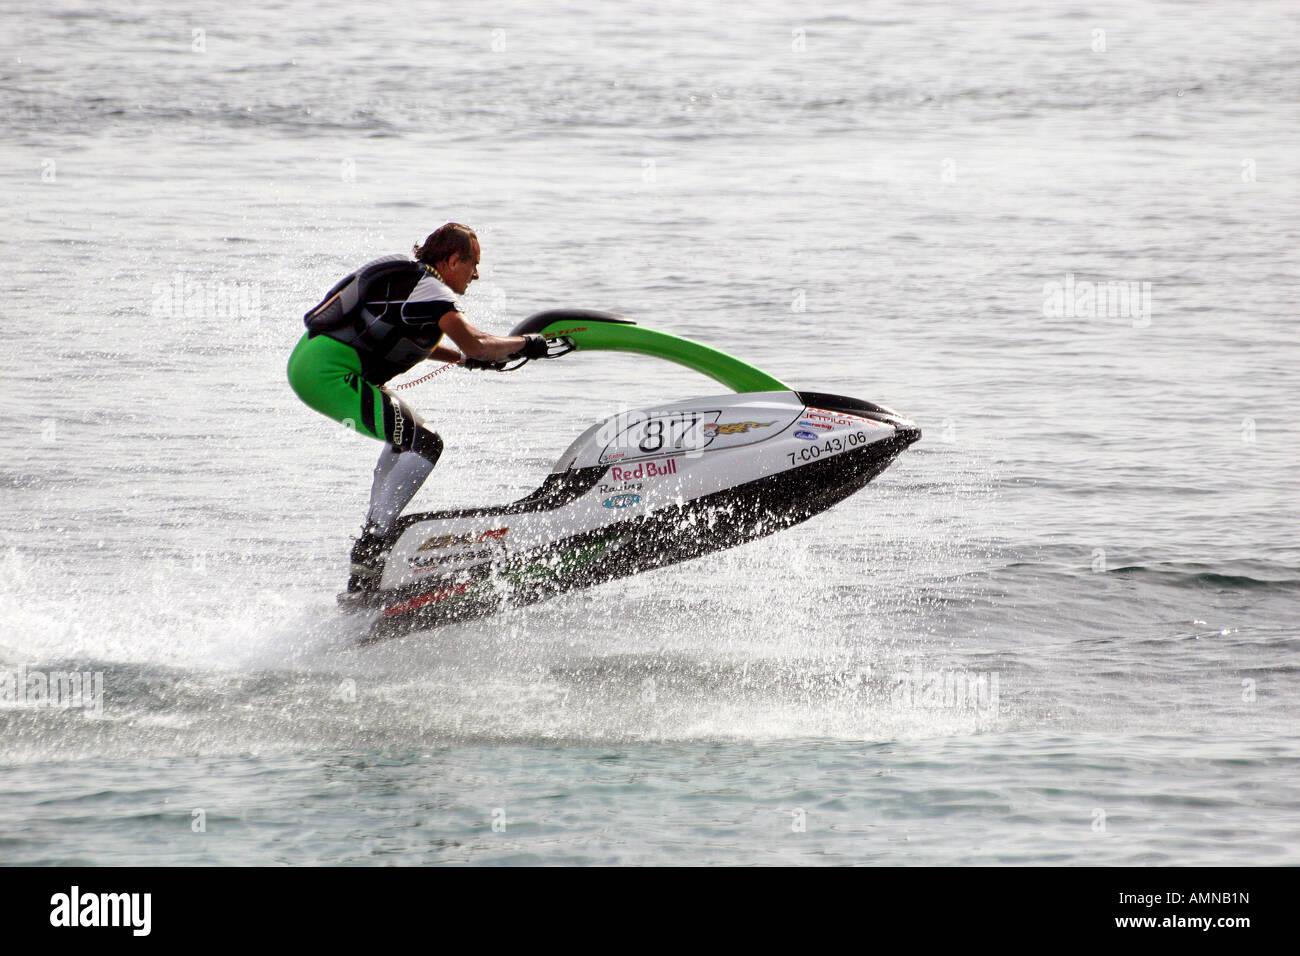 Man At Speed On A Standing Type Water Jet Ski Bike Stock Photo